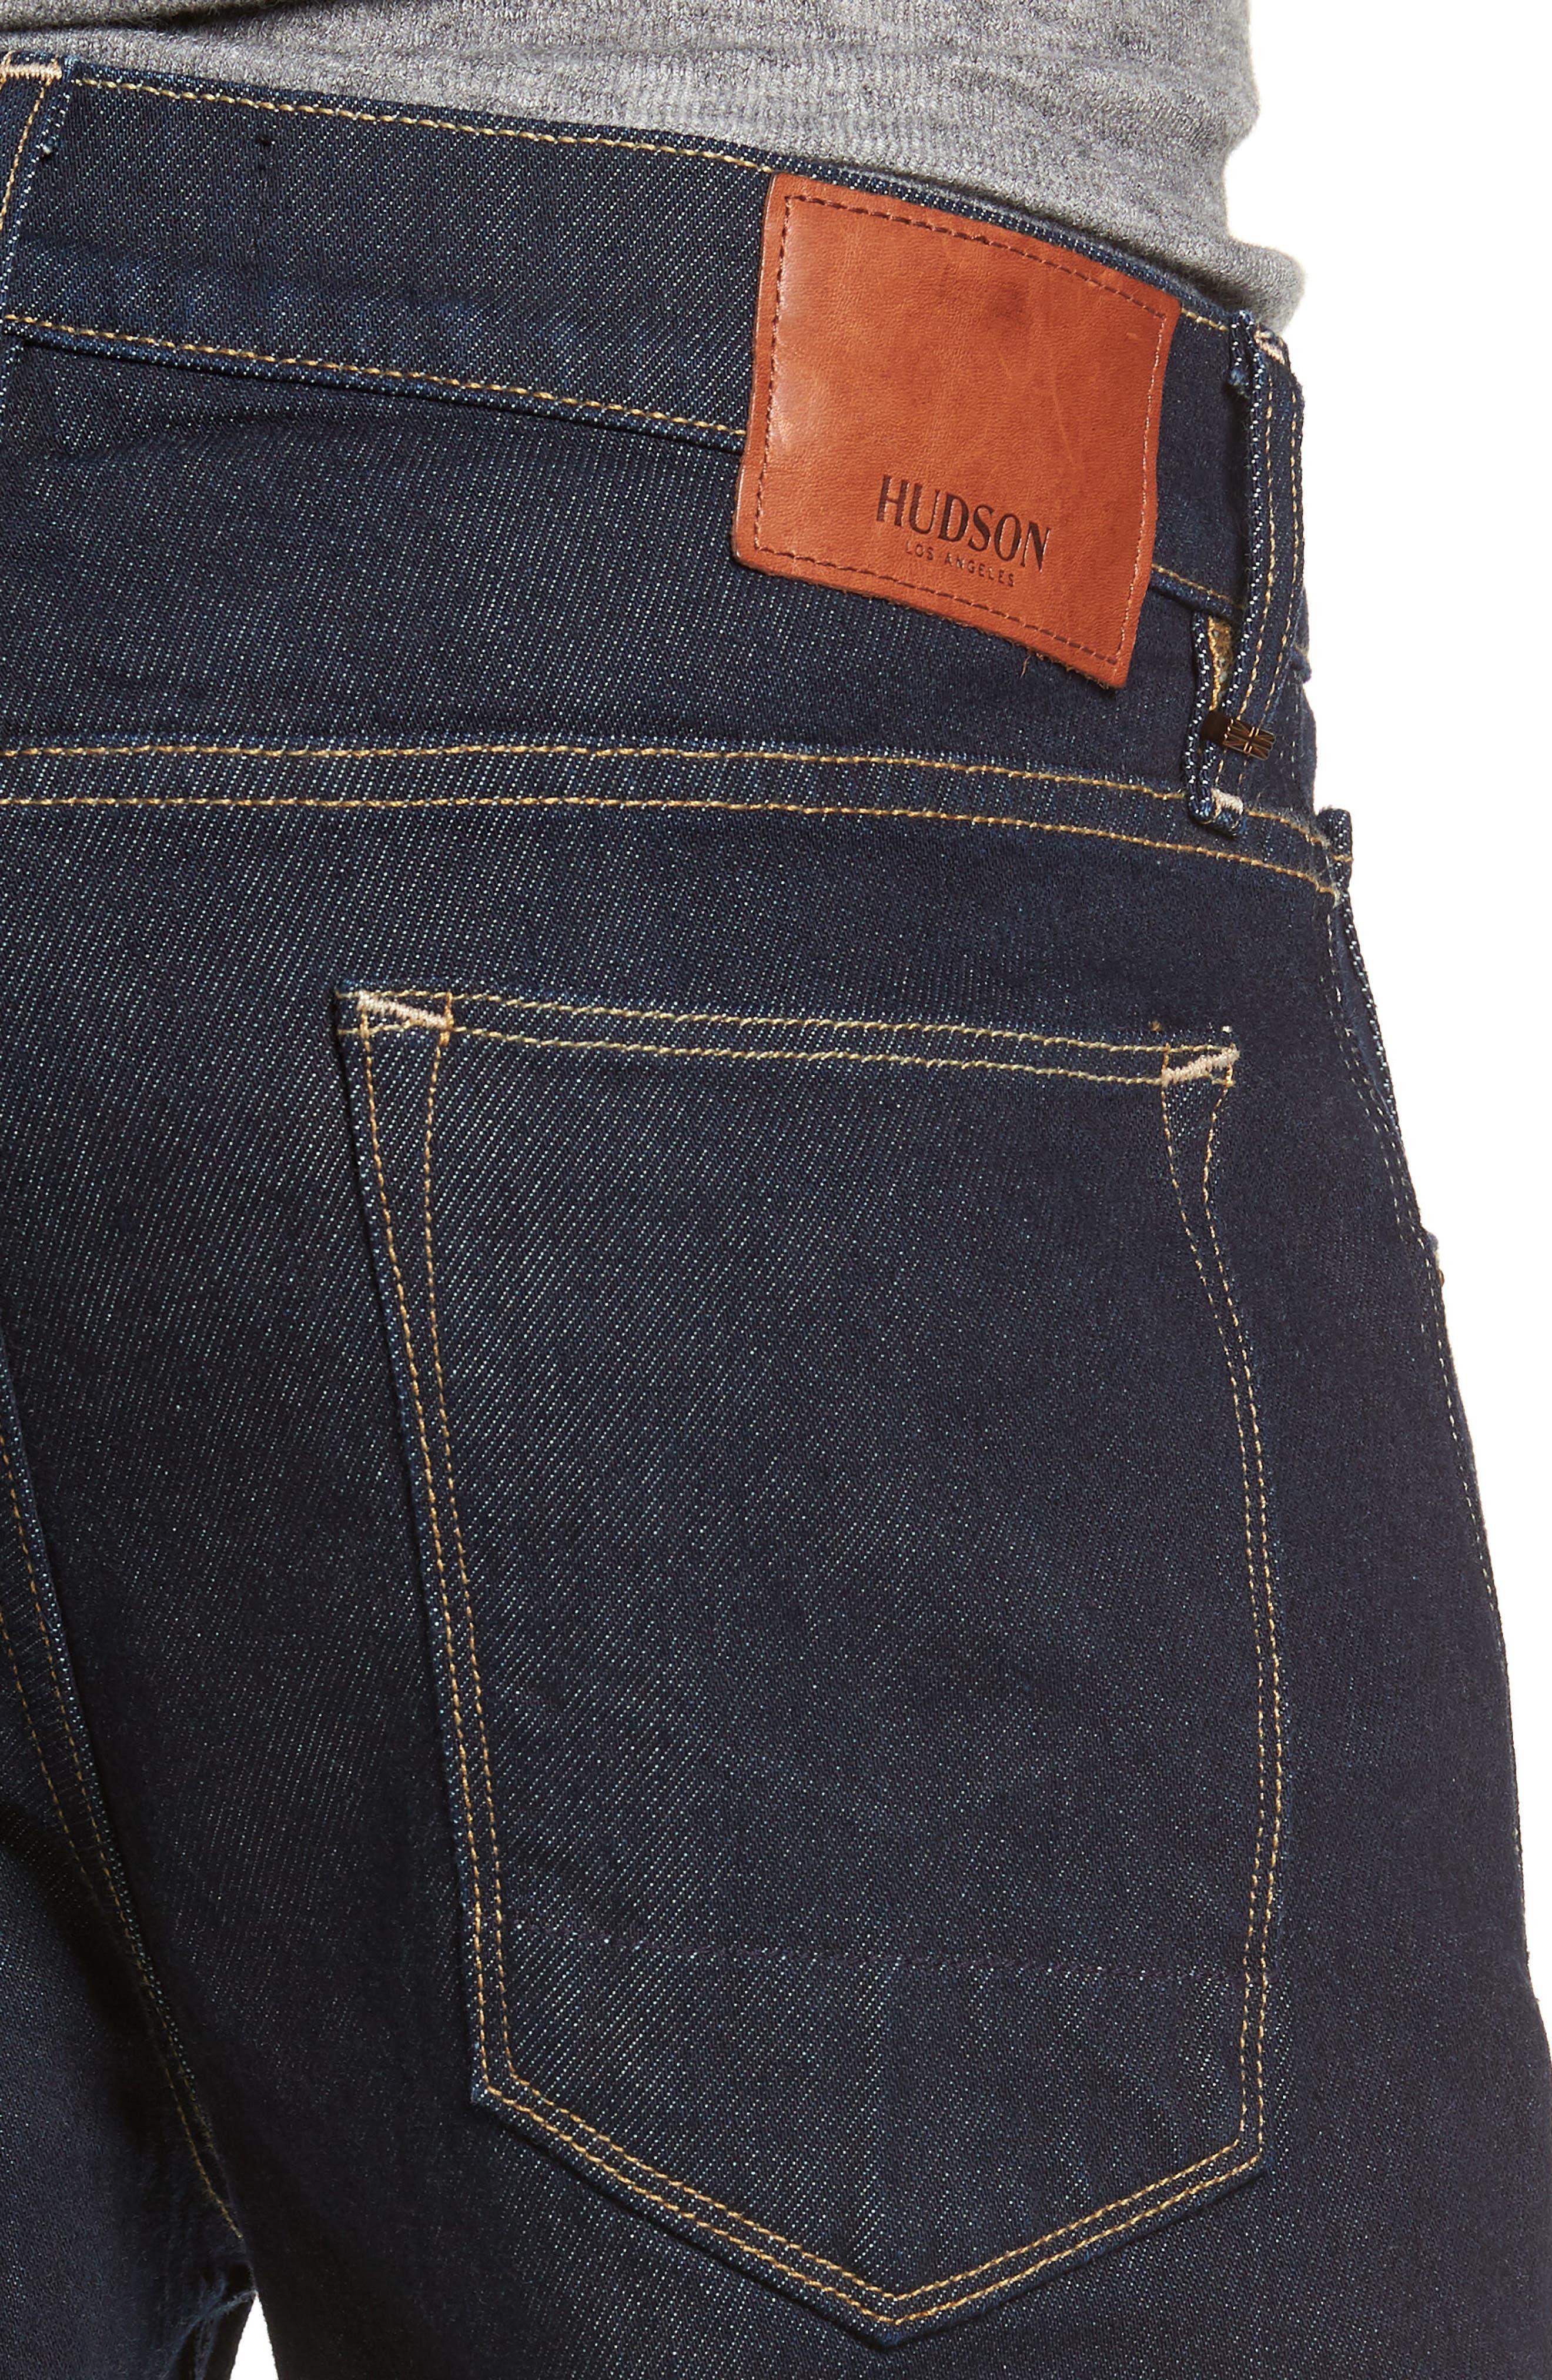 Blake Slim Fit Jeans,                             Alternate thumbnail 4, color,                             DUARTE